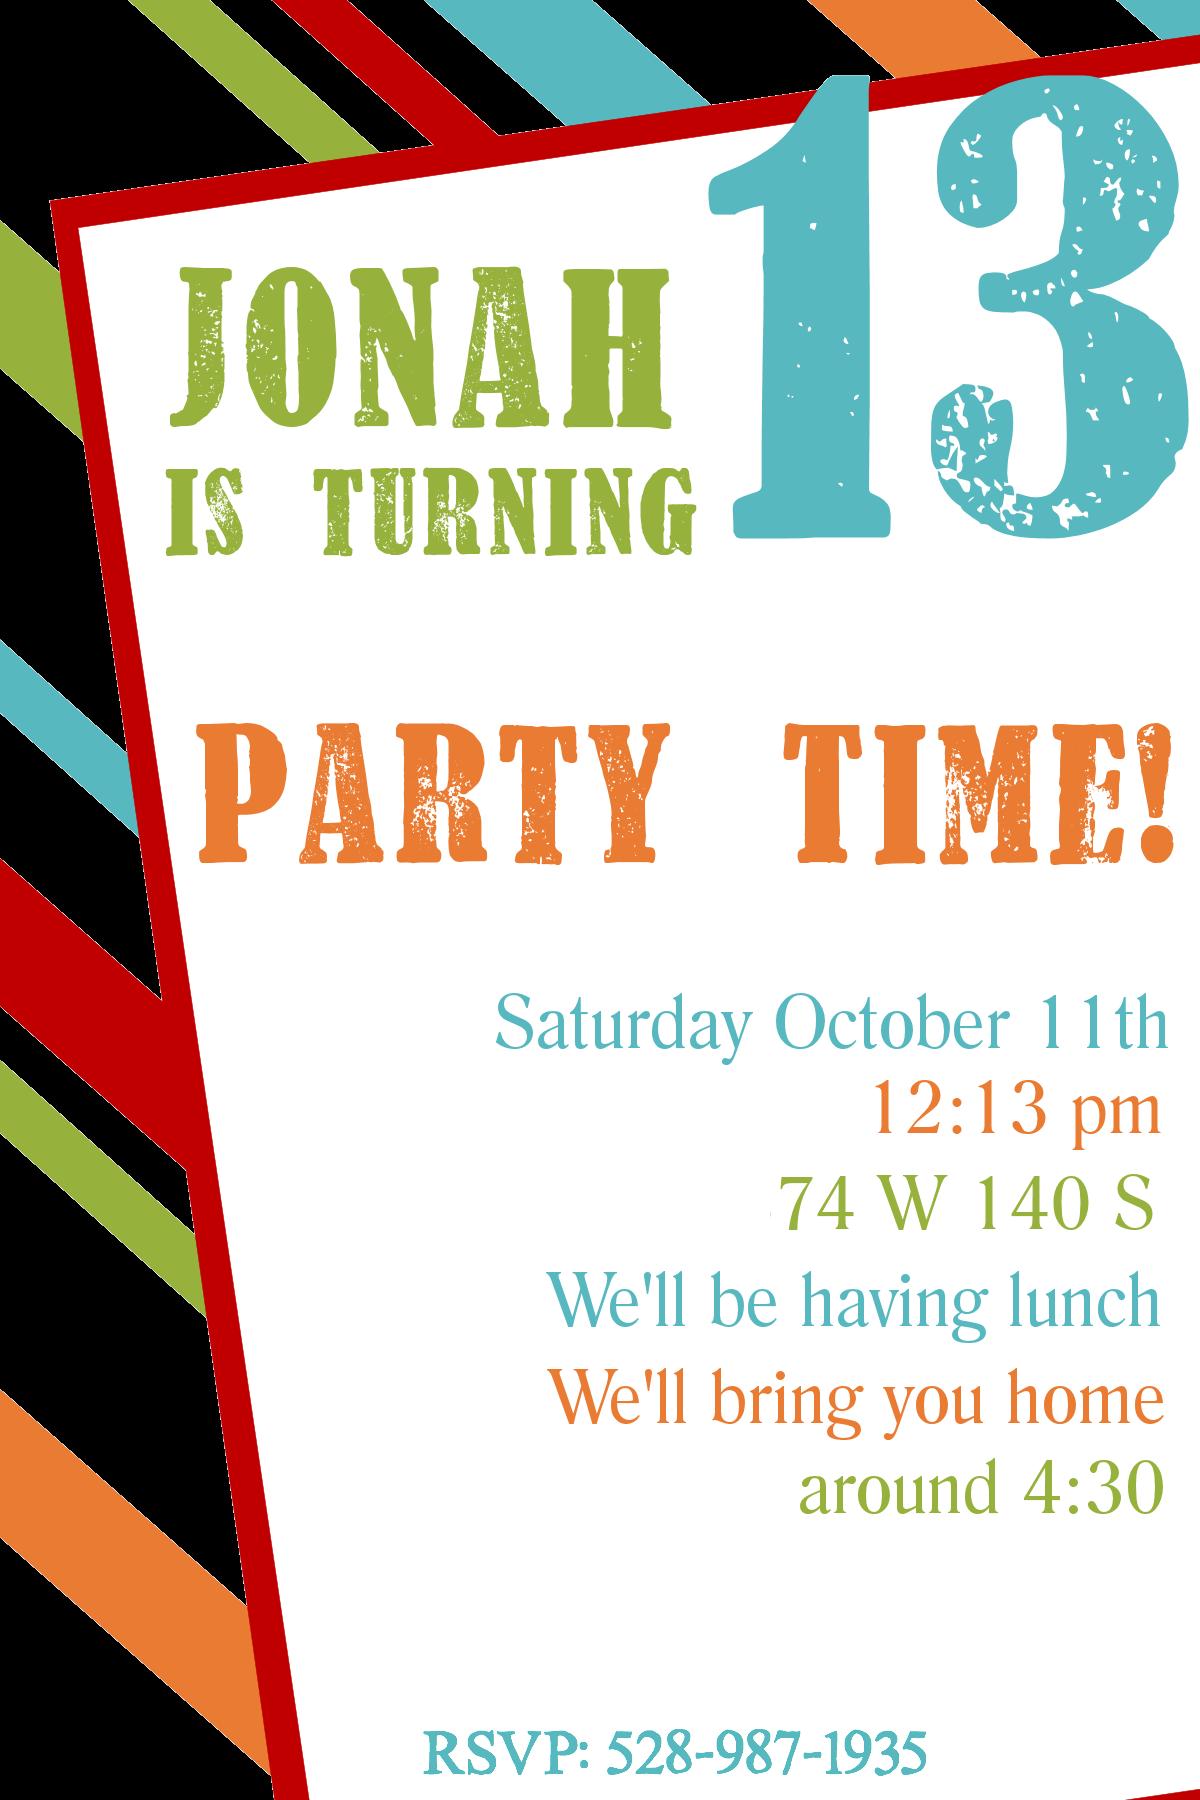 25 Adding Birthday Invitation Templates Digital With Stunning Design with Birthday Invitation Templates Digital